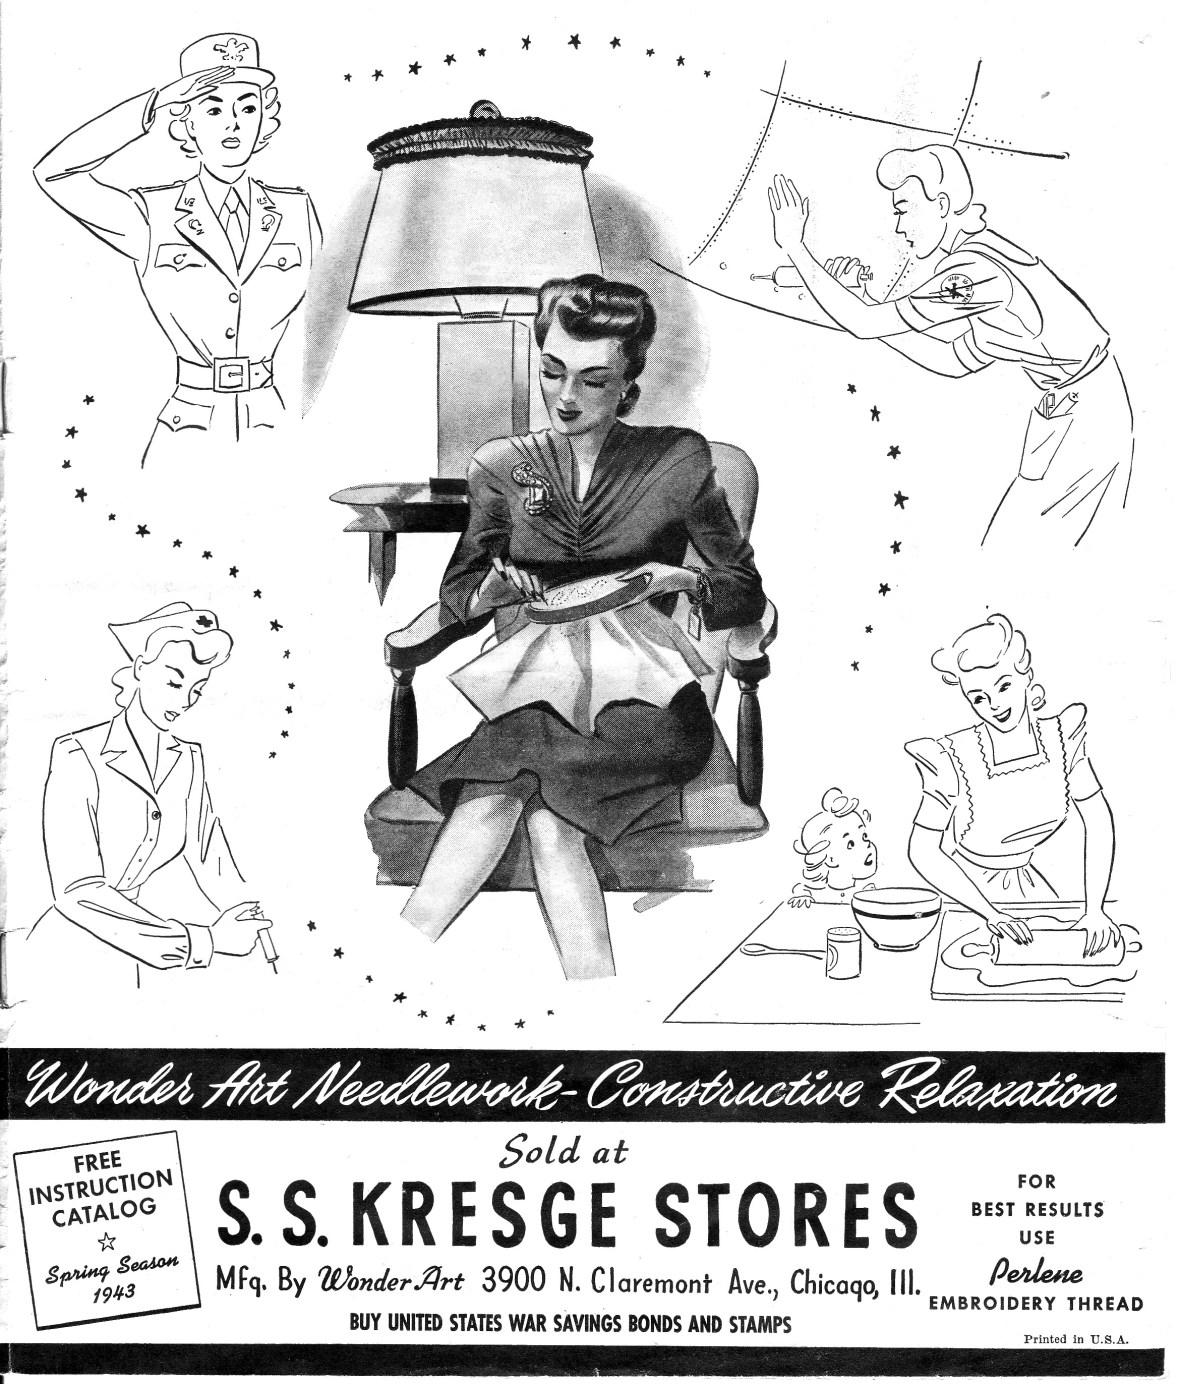 S. S. Kresge Stores - 1943